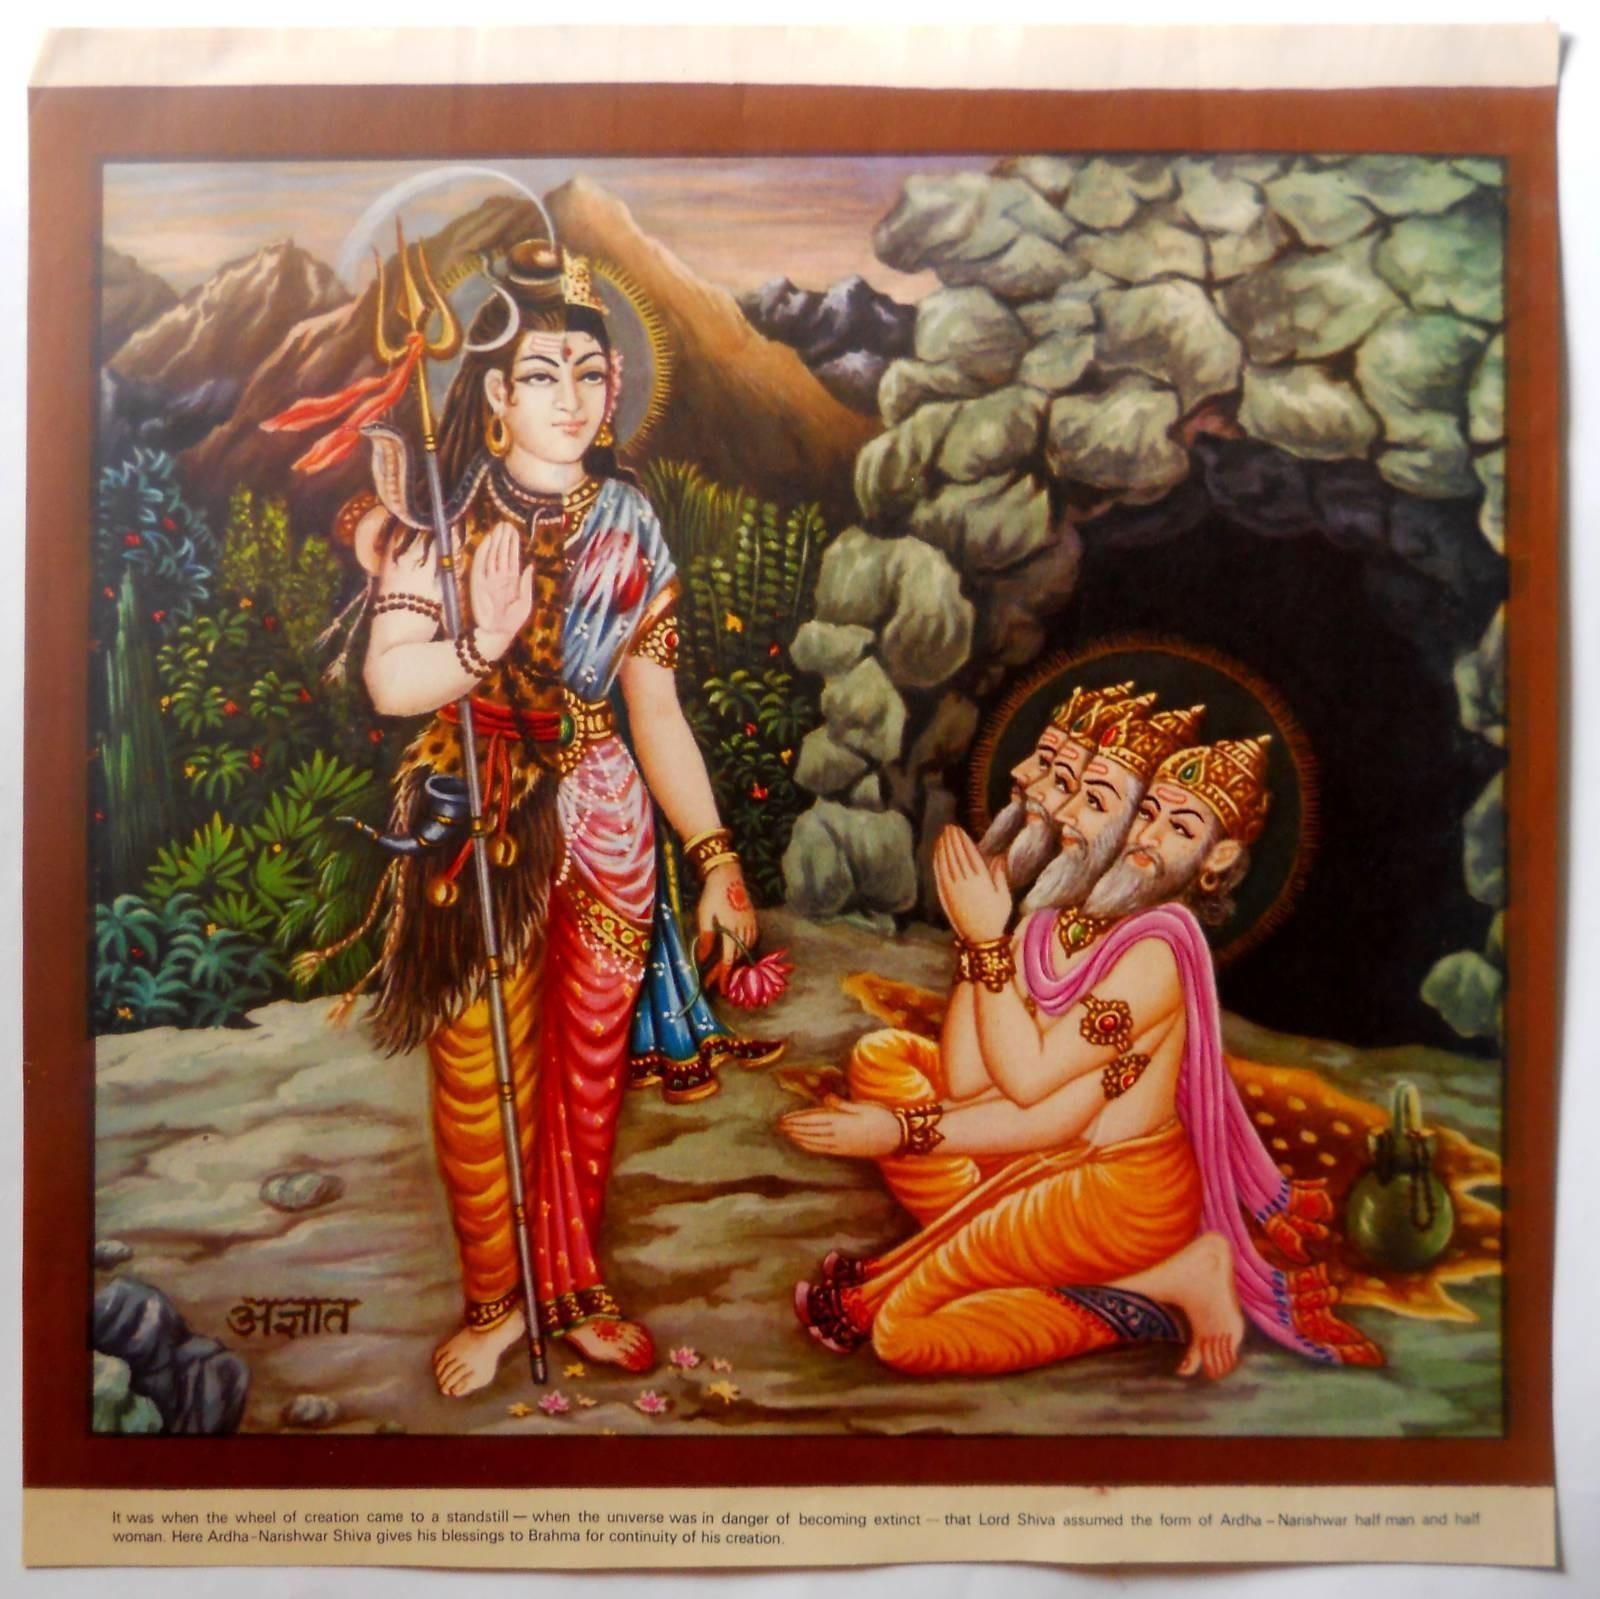 Ardha- Narishwashwar Shiva Gives His Blessings To Brahma